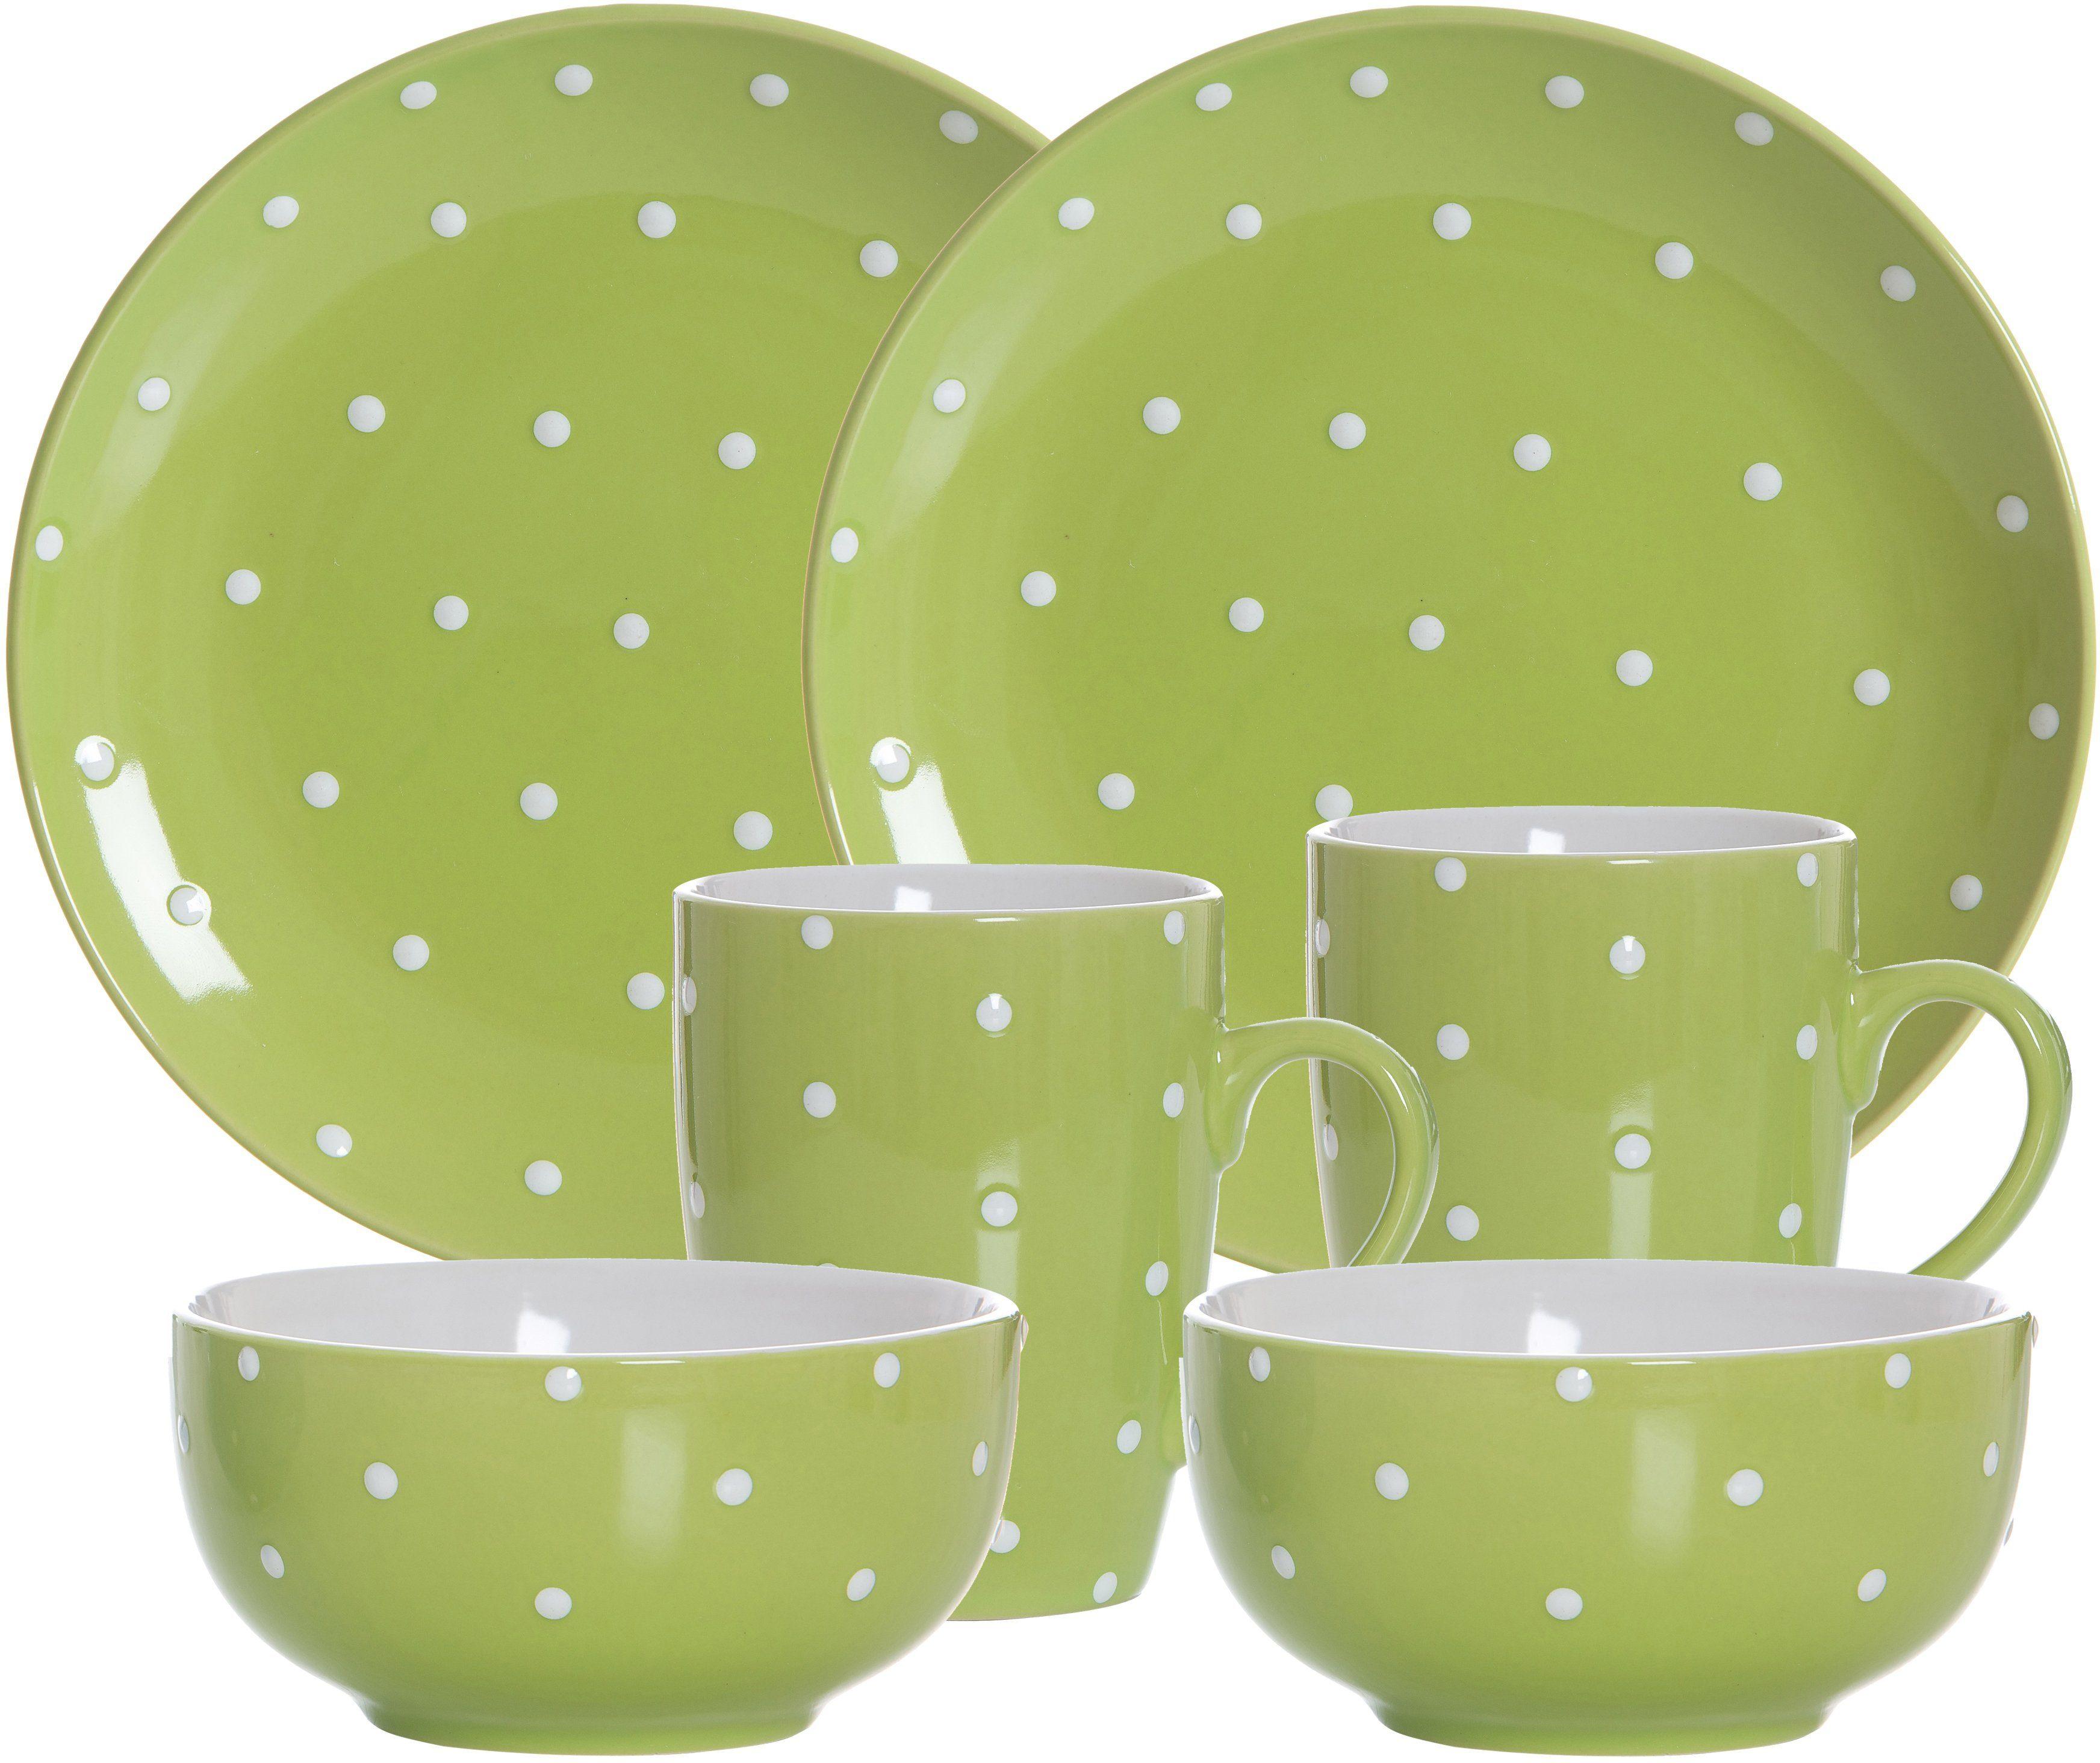 Ritzenhoff & Breker Frühstück-Set, Keramik, 6 Teile, »PINTO«